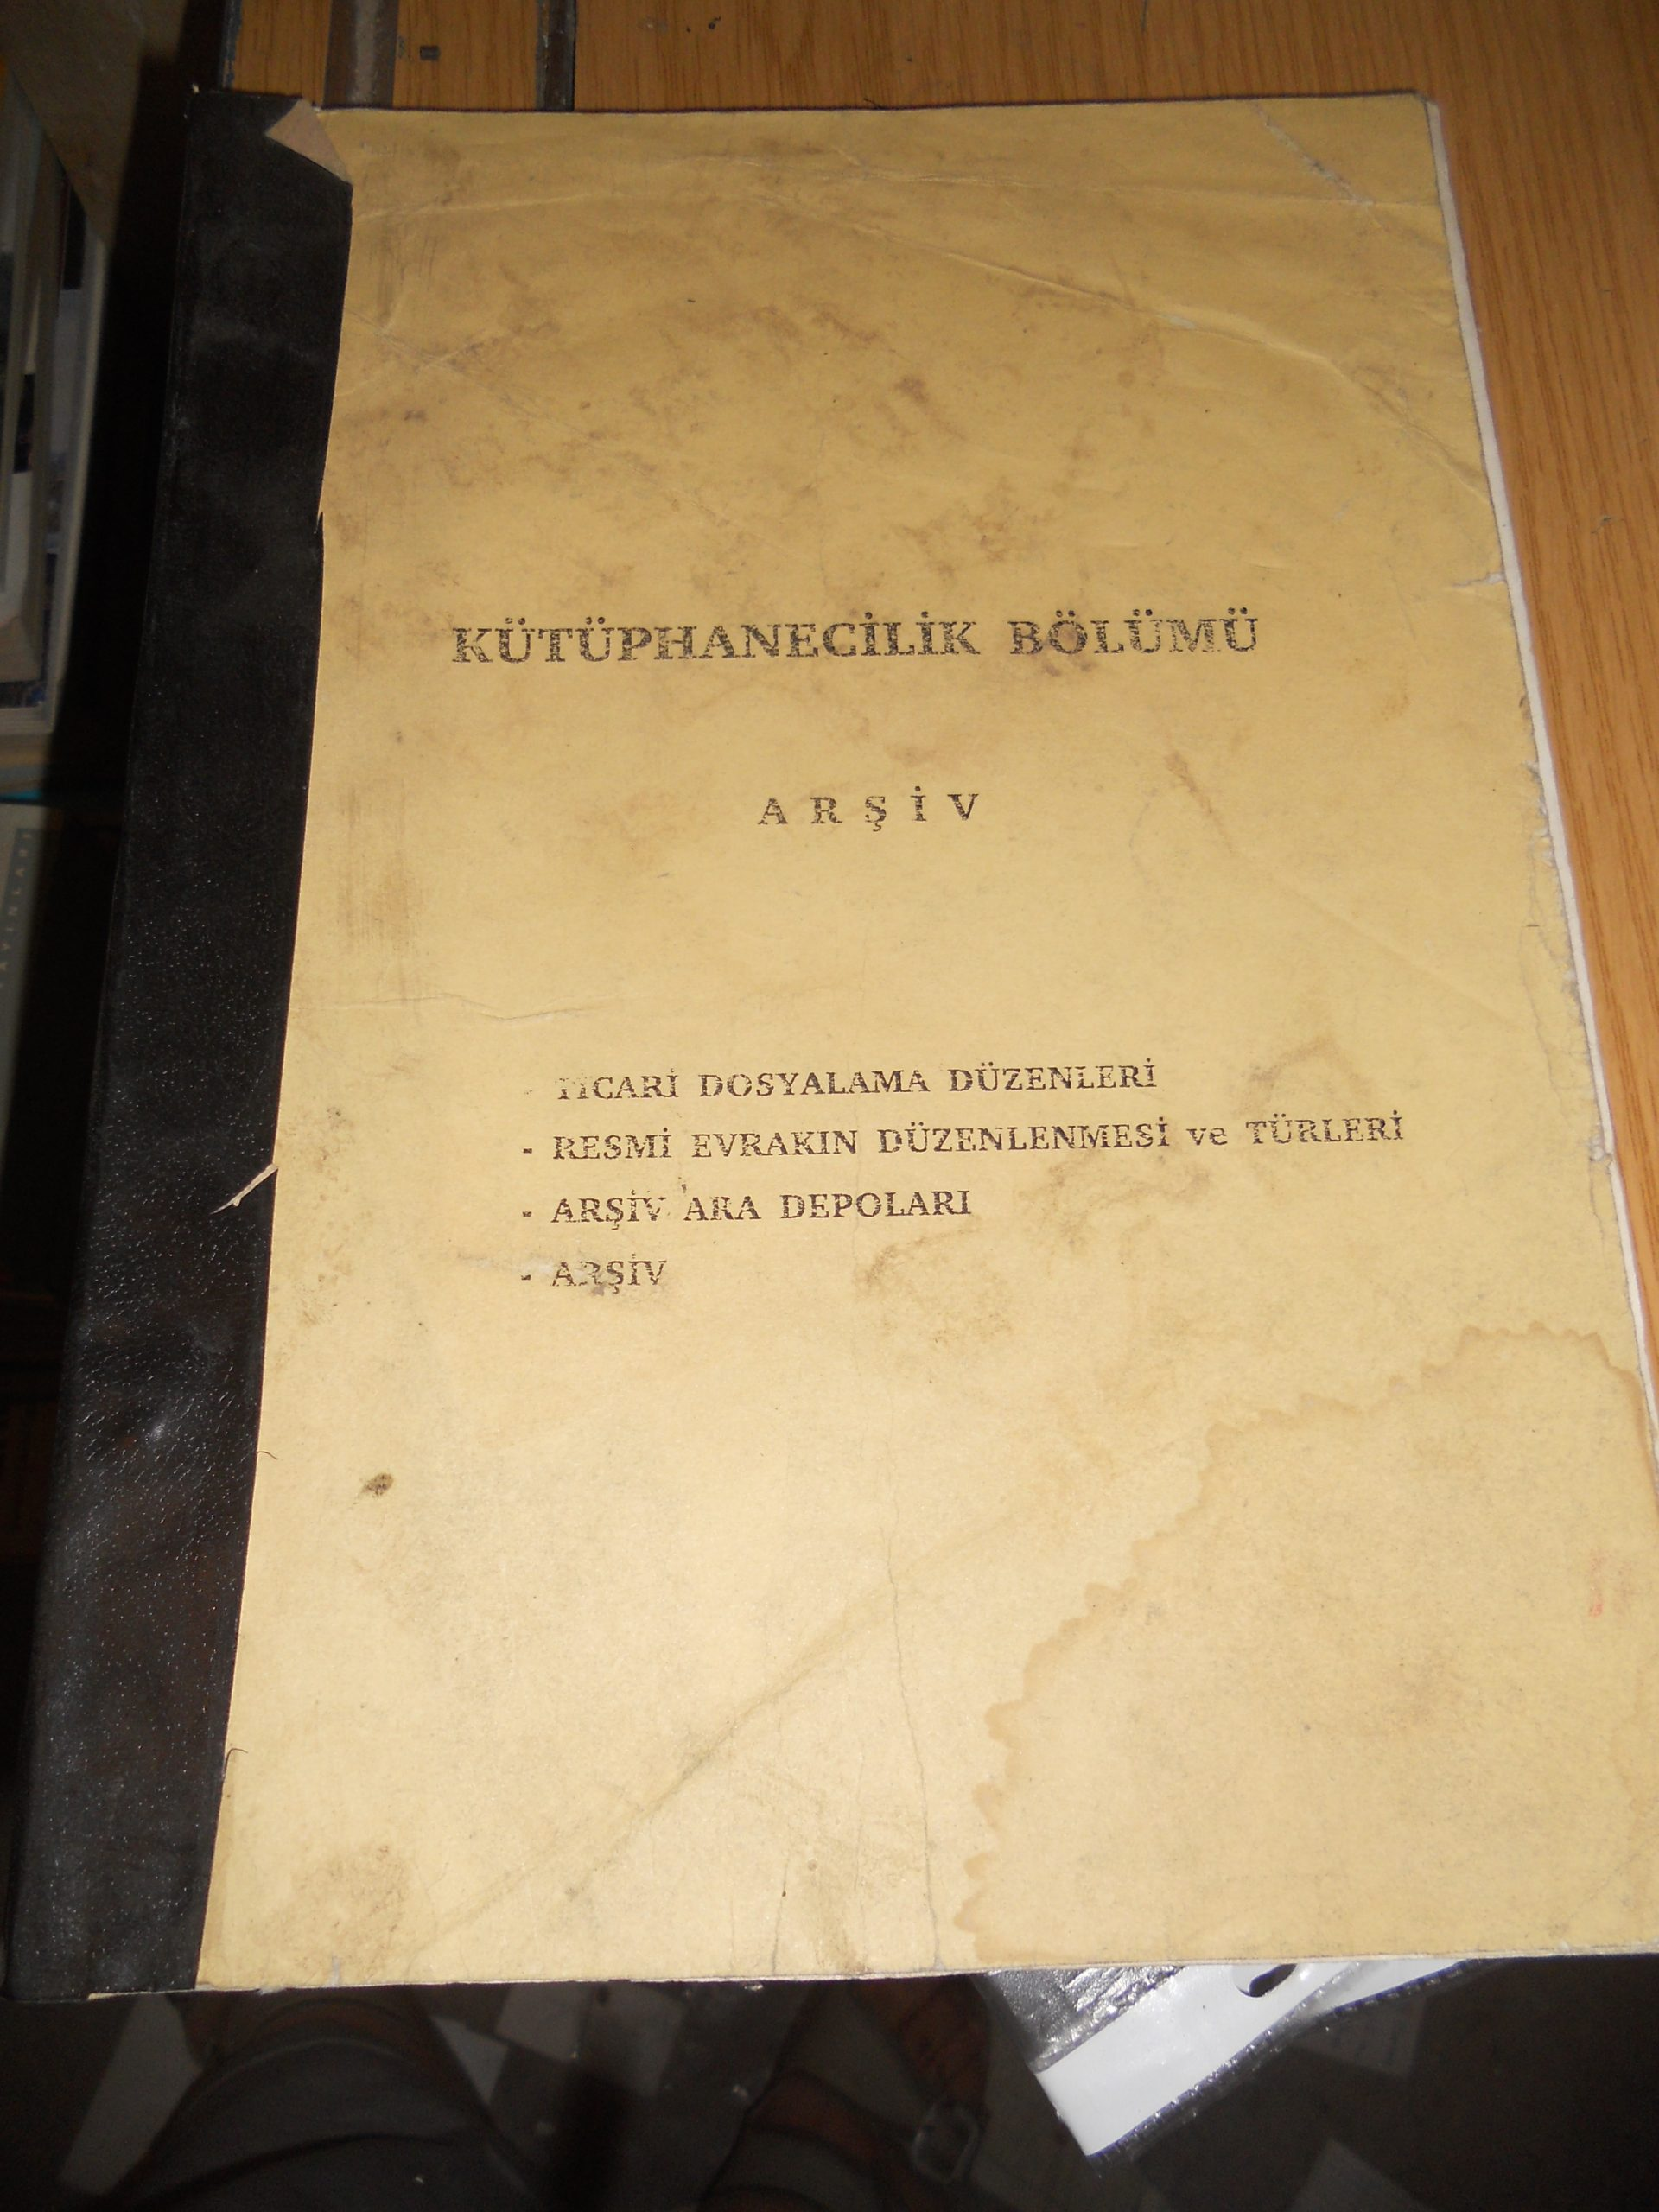 KÜTÜPHANECİLİK BÖLÜMÜ-ARŞİV-/20TL